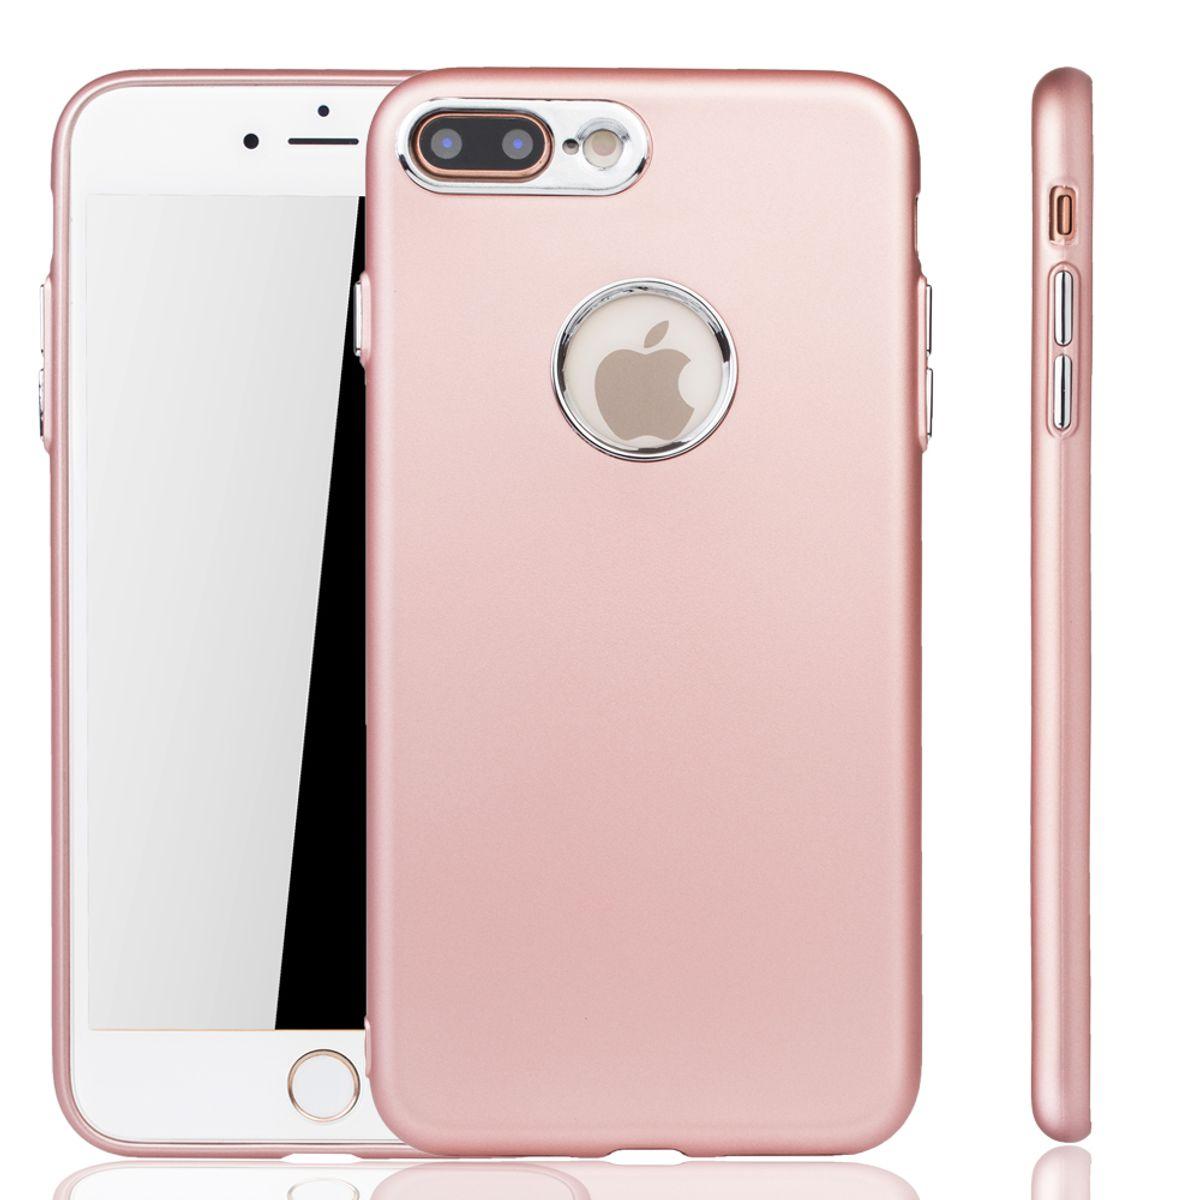 apple iphone 7 8 plus h lle handyh lle f r apple iphone 7 8 plus handy case in rose pink. Black Bedroom Furniture Sets. Home Design Ideas